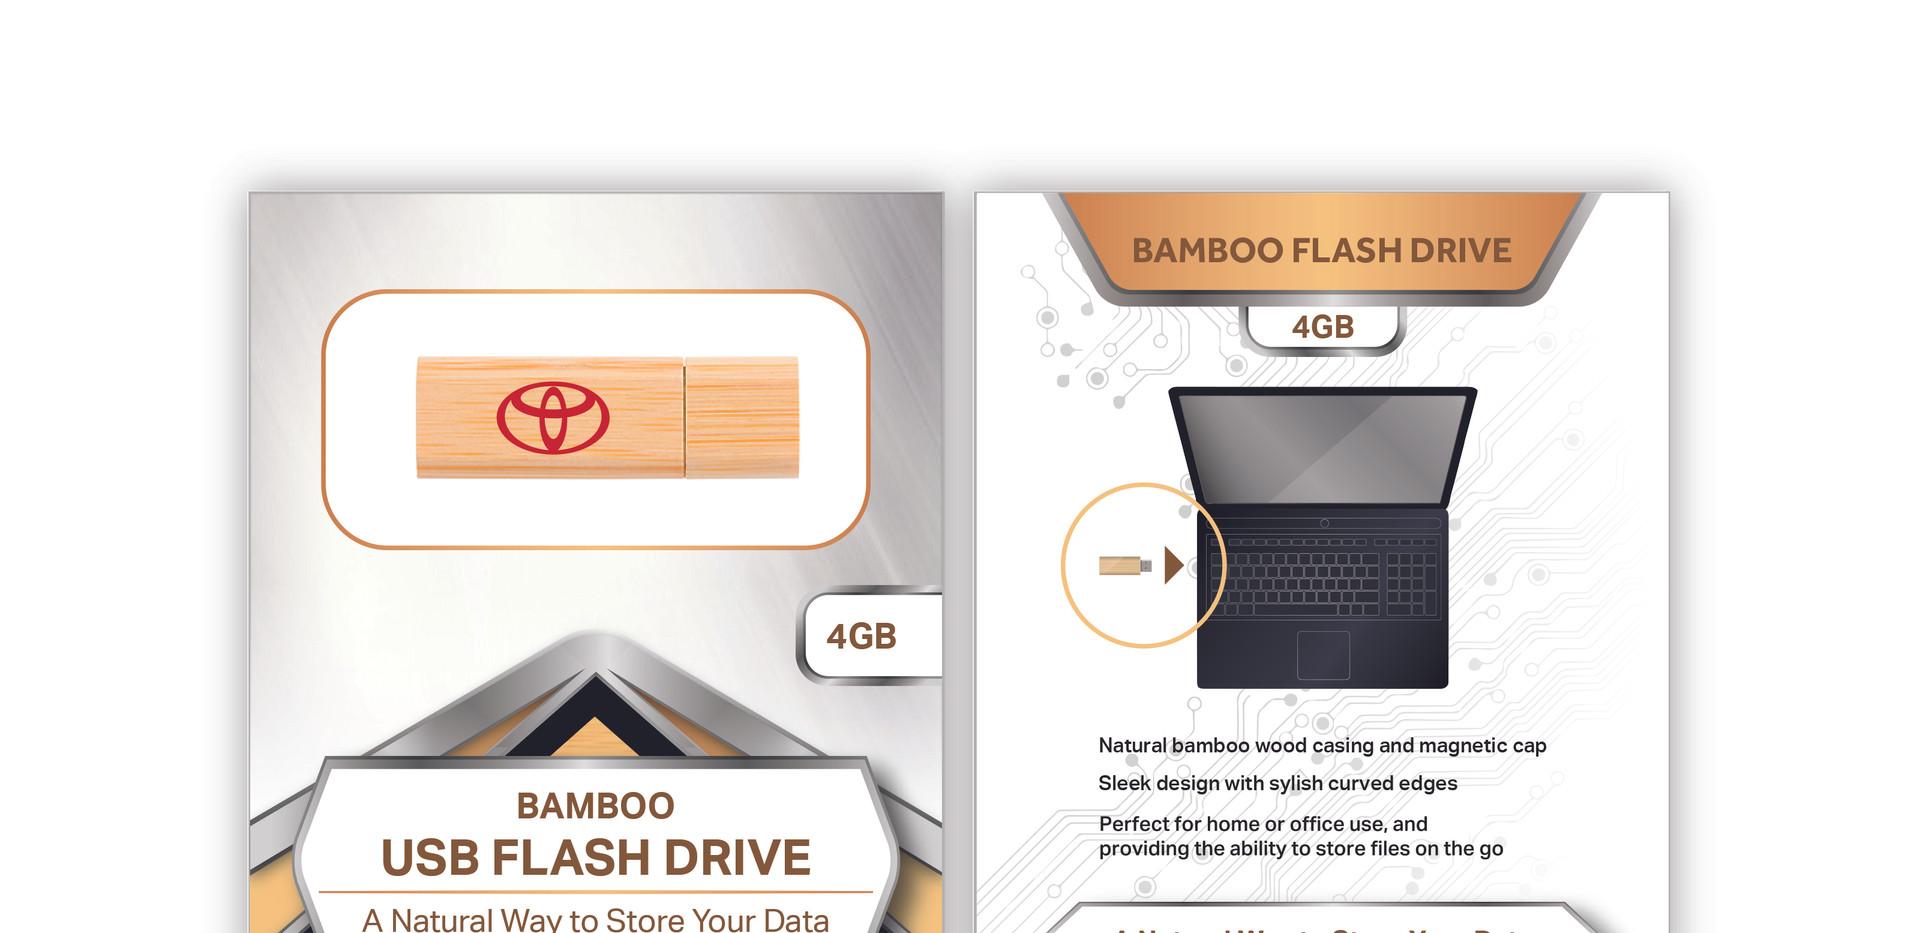 Toyota Bamboo Flash Drive standard packa